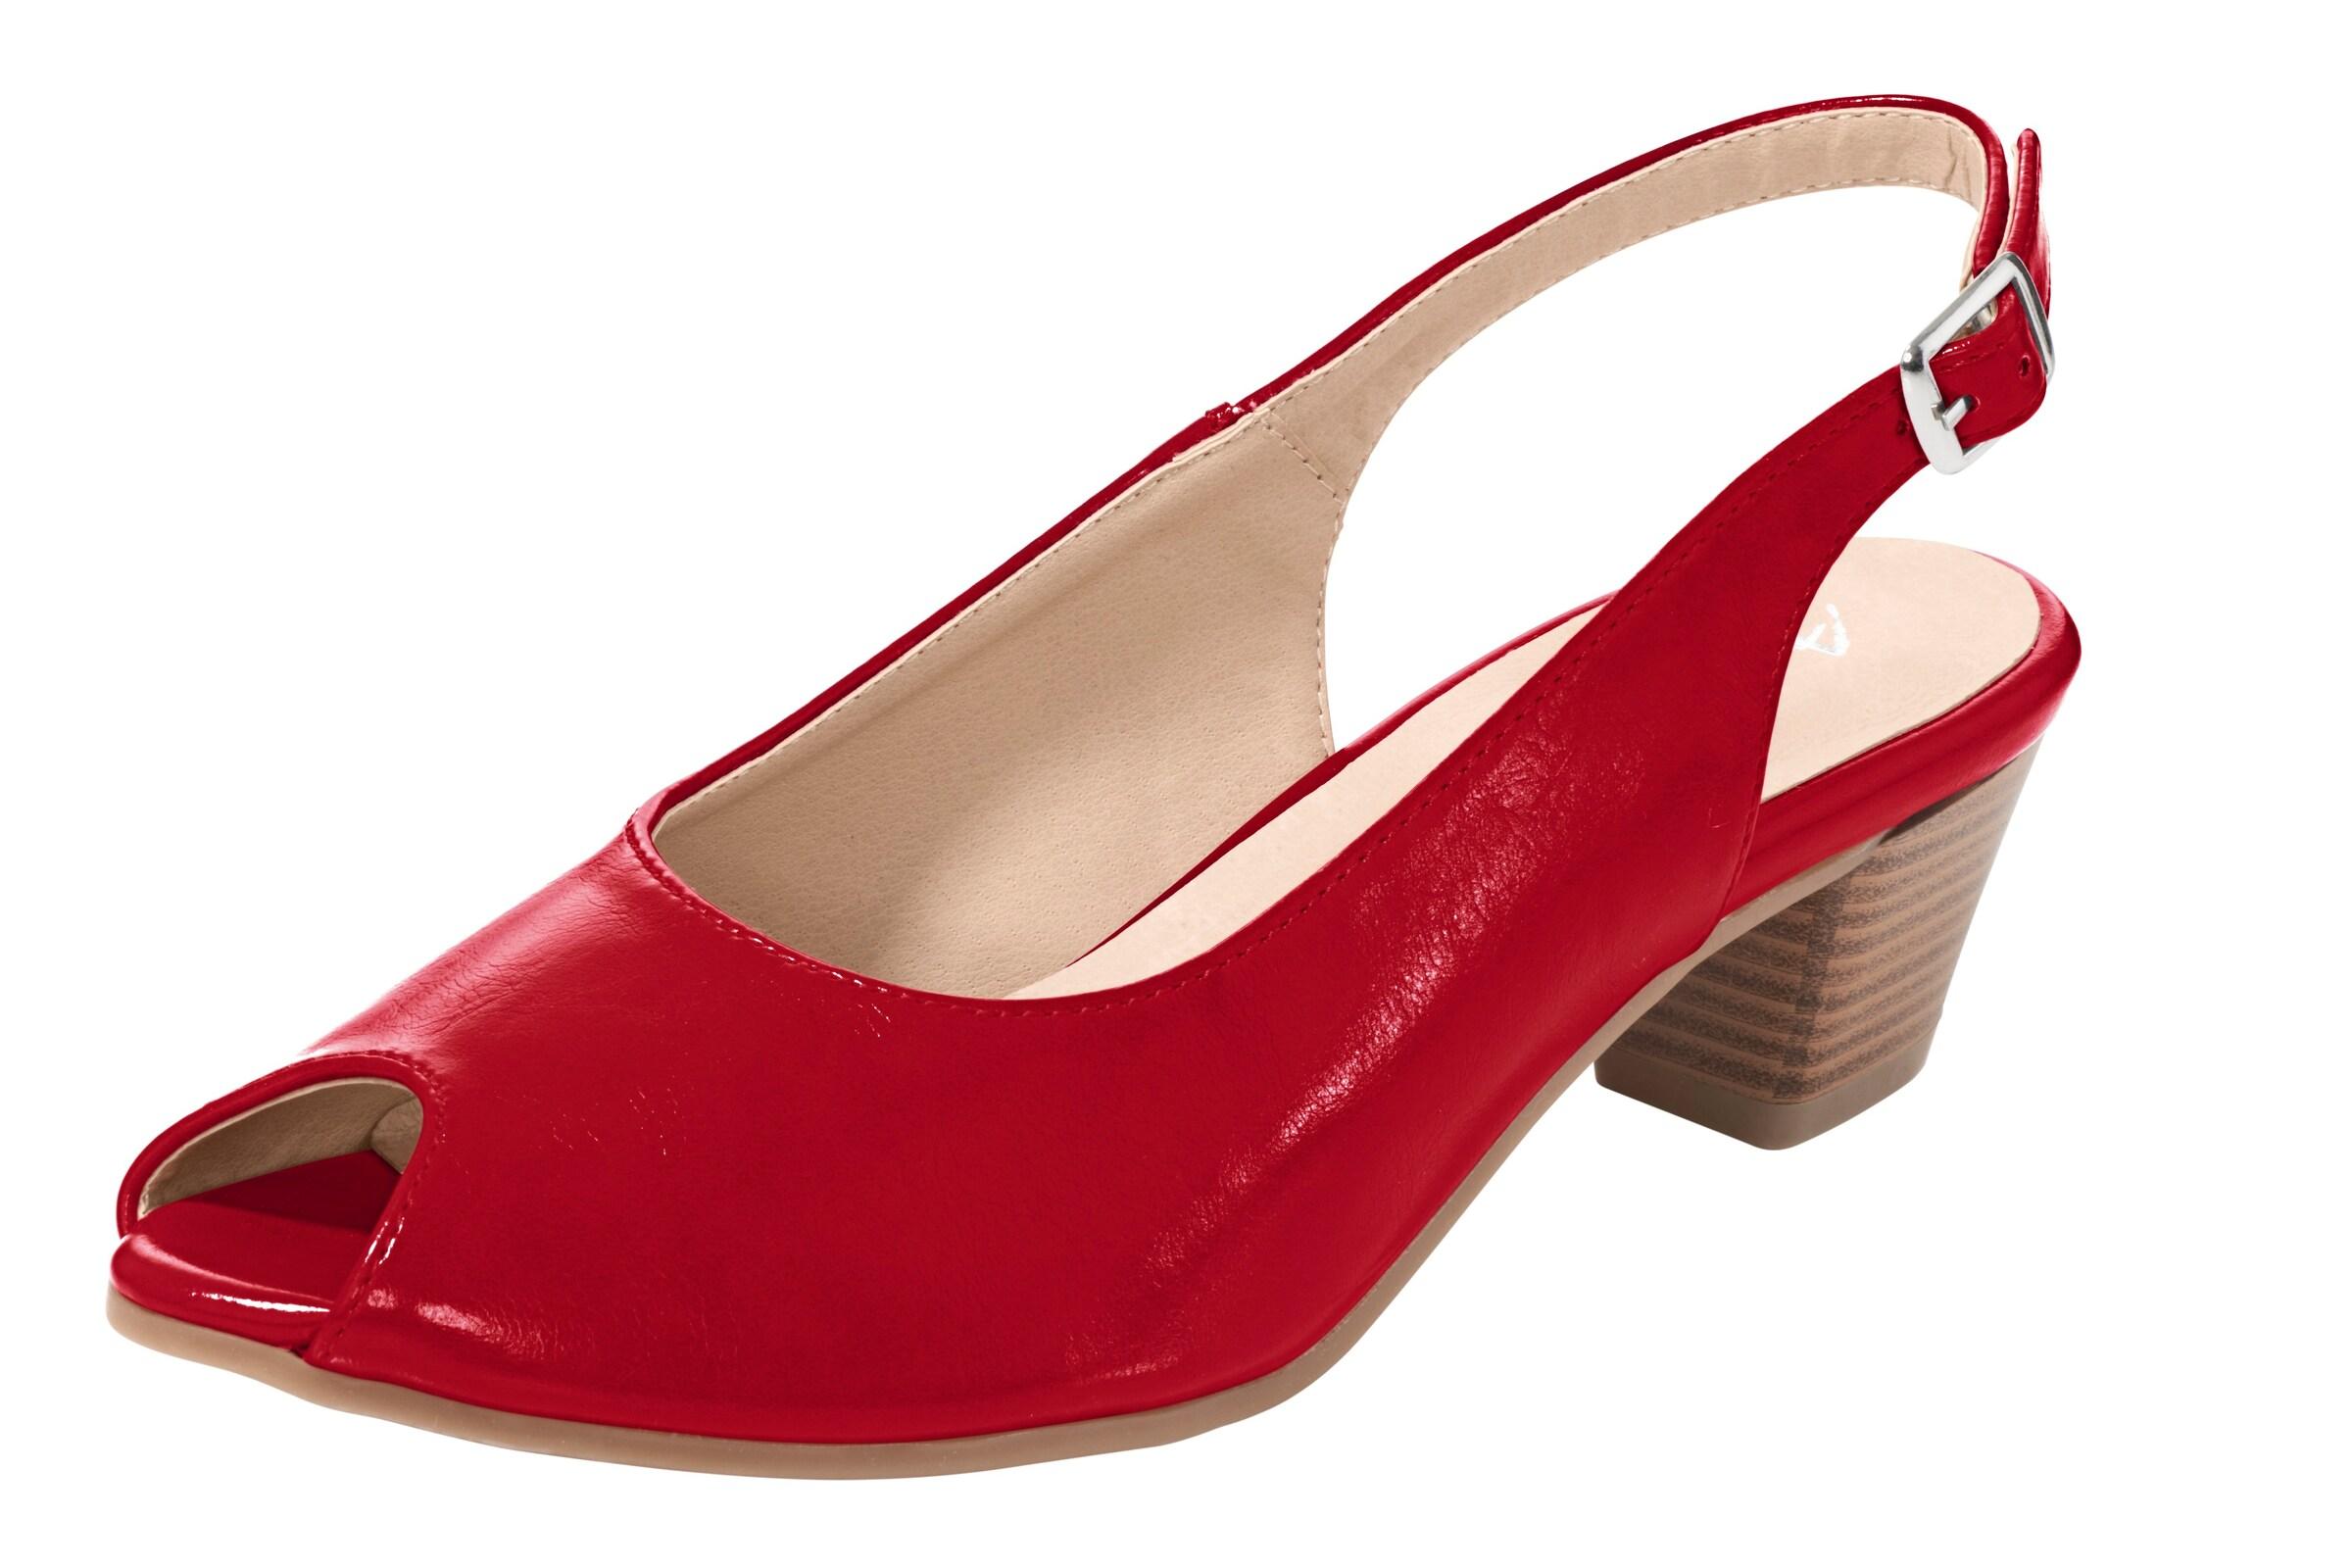 ANDREA CONTI Slingpumps Günstige und langlebige Schuhe